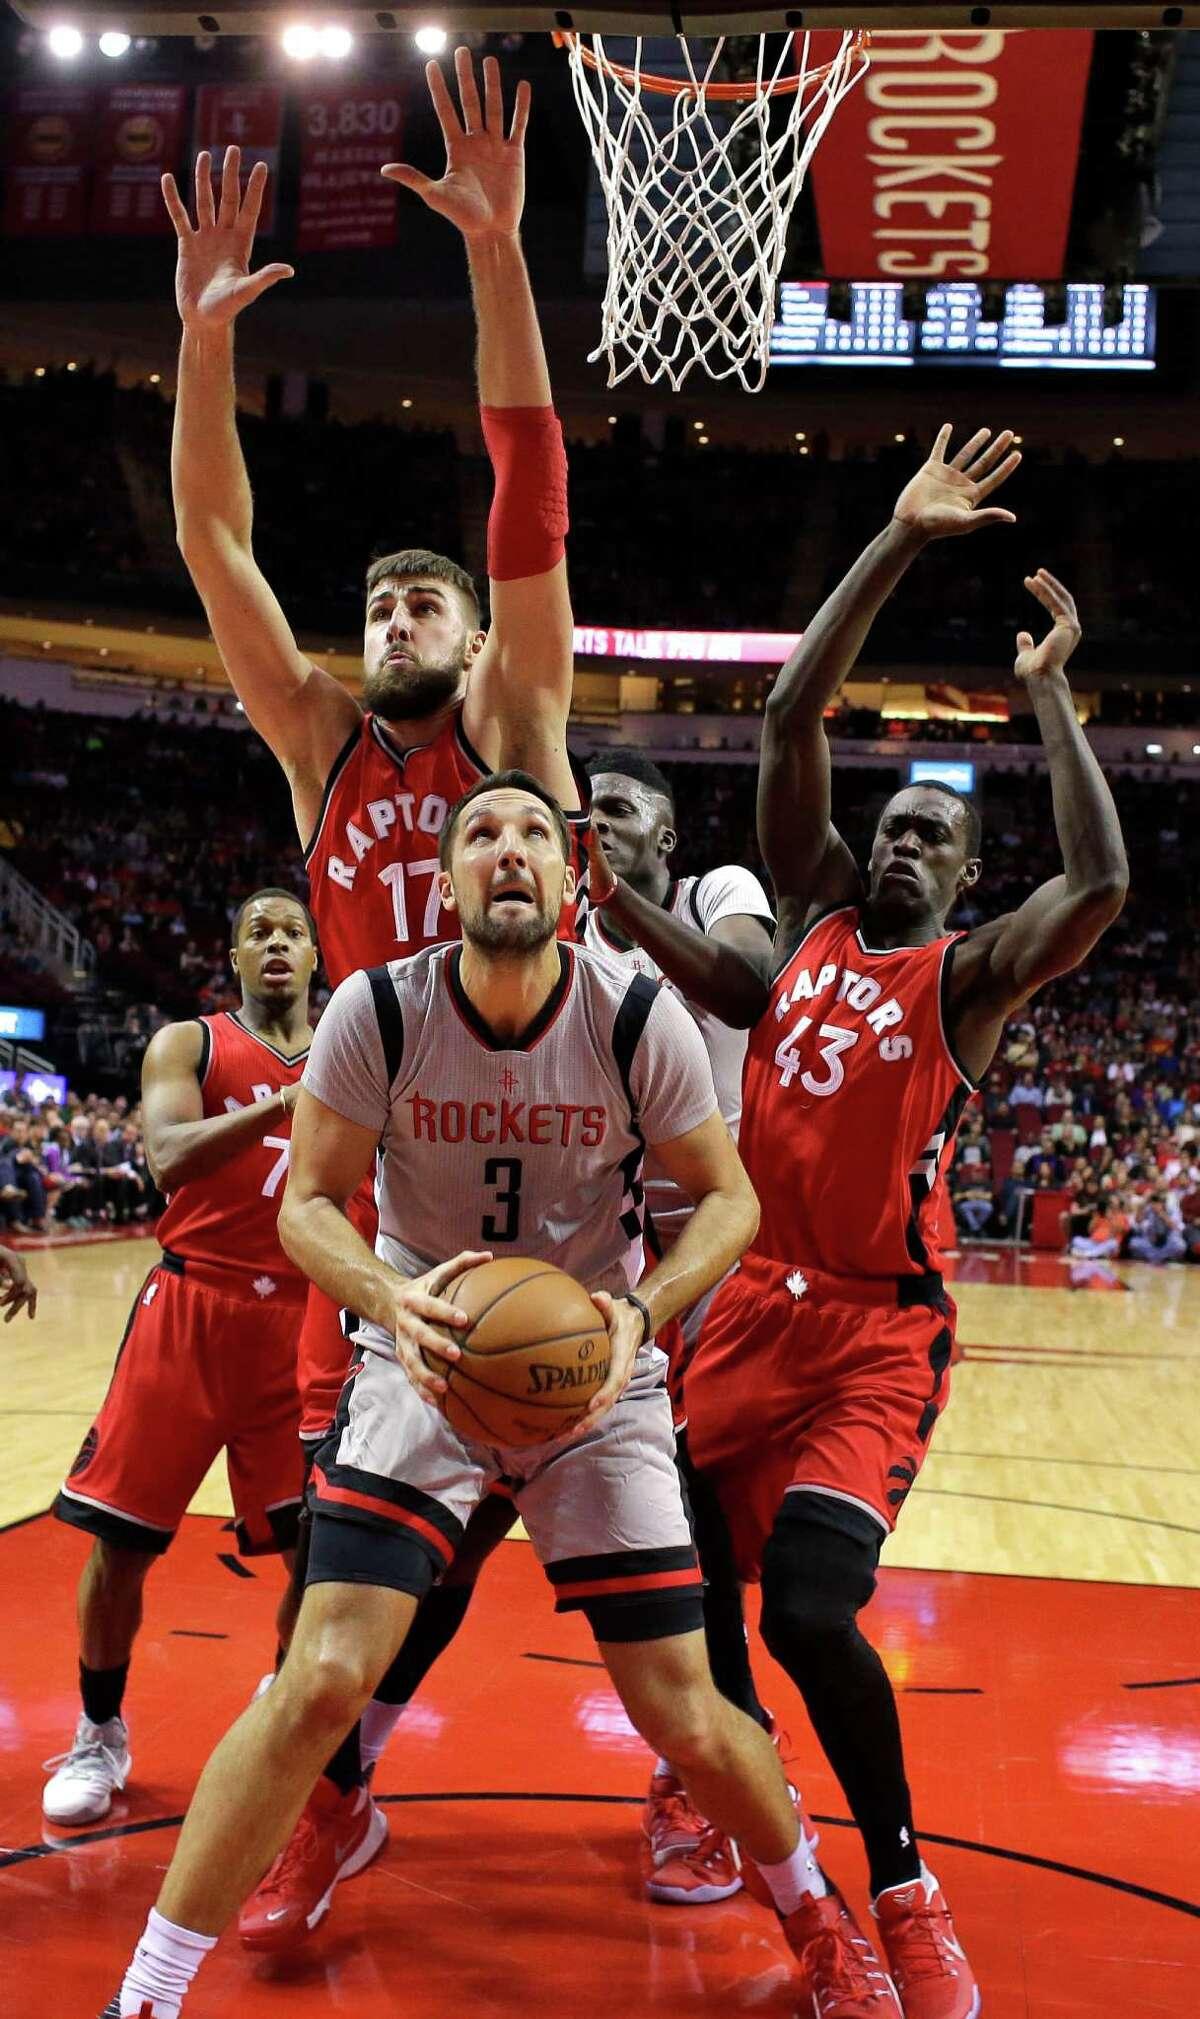 Houston Rockets' Ryan Anderson (3) looks to shoot as Toronto Raptors' Jonas Valanciunas (17) and Pascal Siakam (43) defend during the first quarter of an NBA basketball game Wednesday, Nov. 23, 2016, in Houston. (AP Photo/David J. Phillip)